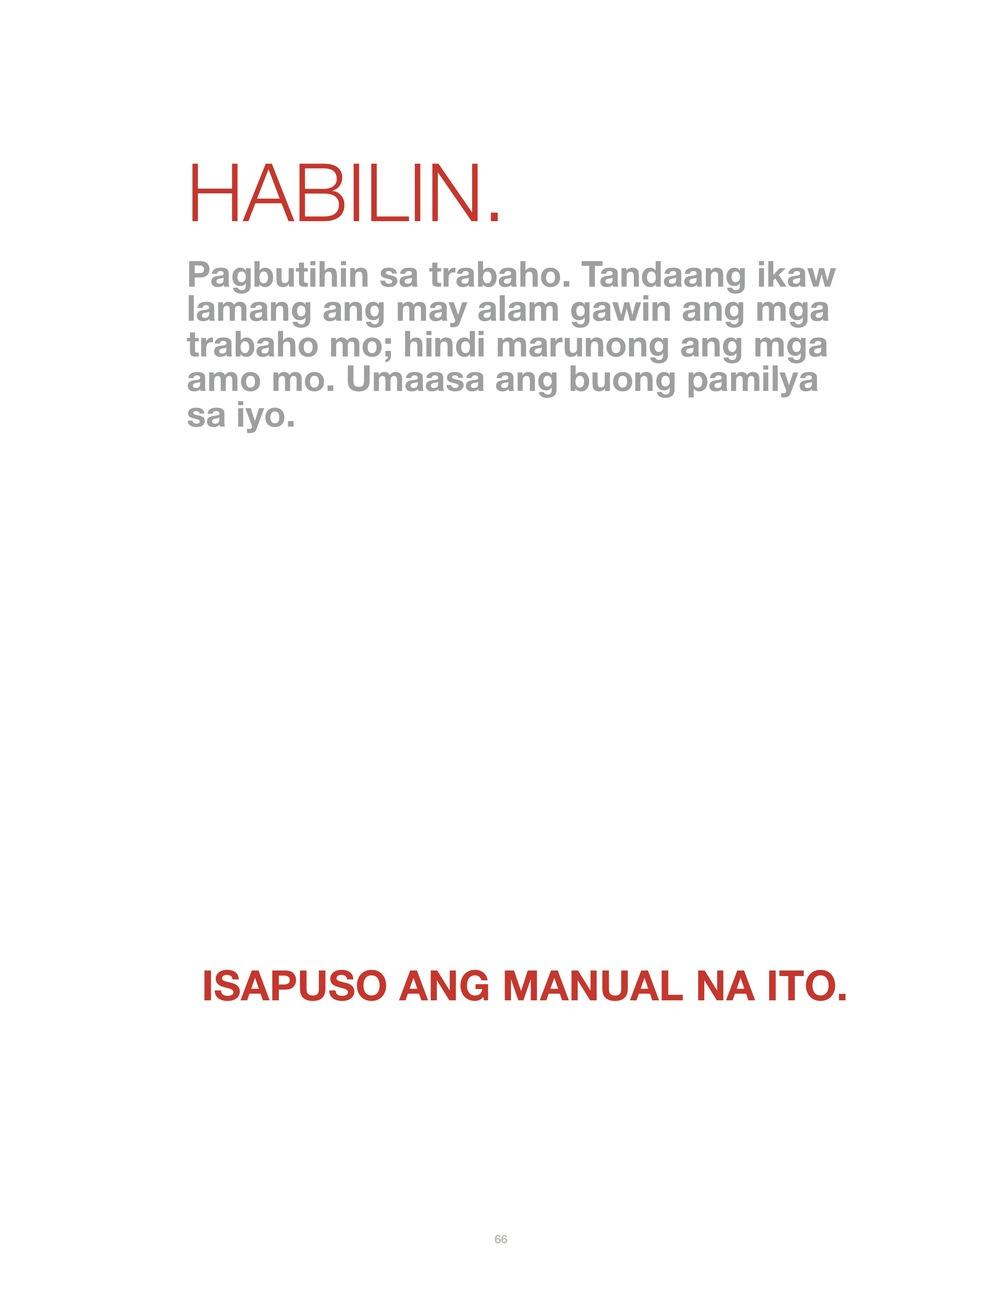 MaidProvider.ph Training Manual NO WATERMARK.pdf 68.jpeg